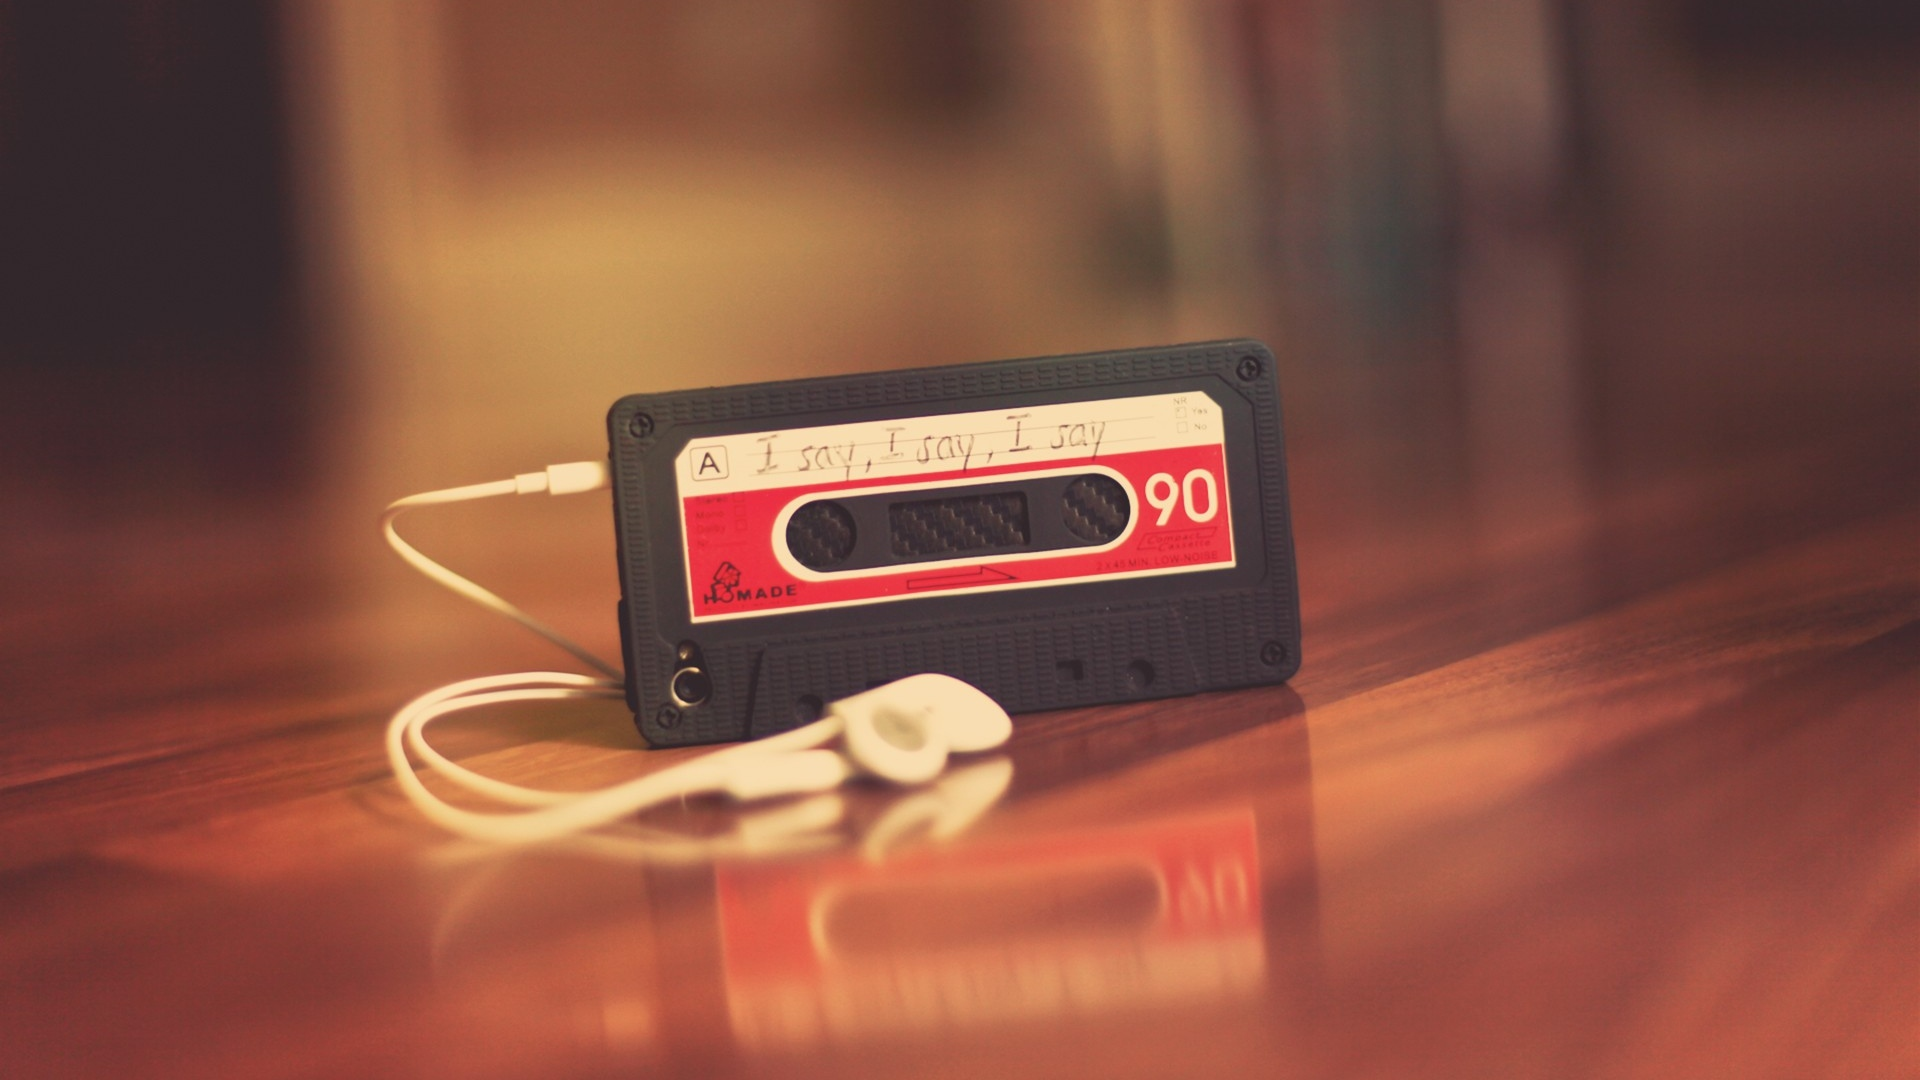 hd hintergrundbilder iphone handy kopfhörer kassette deckel 1920x1080